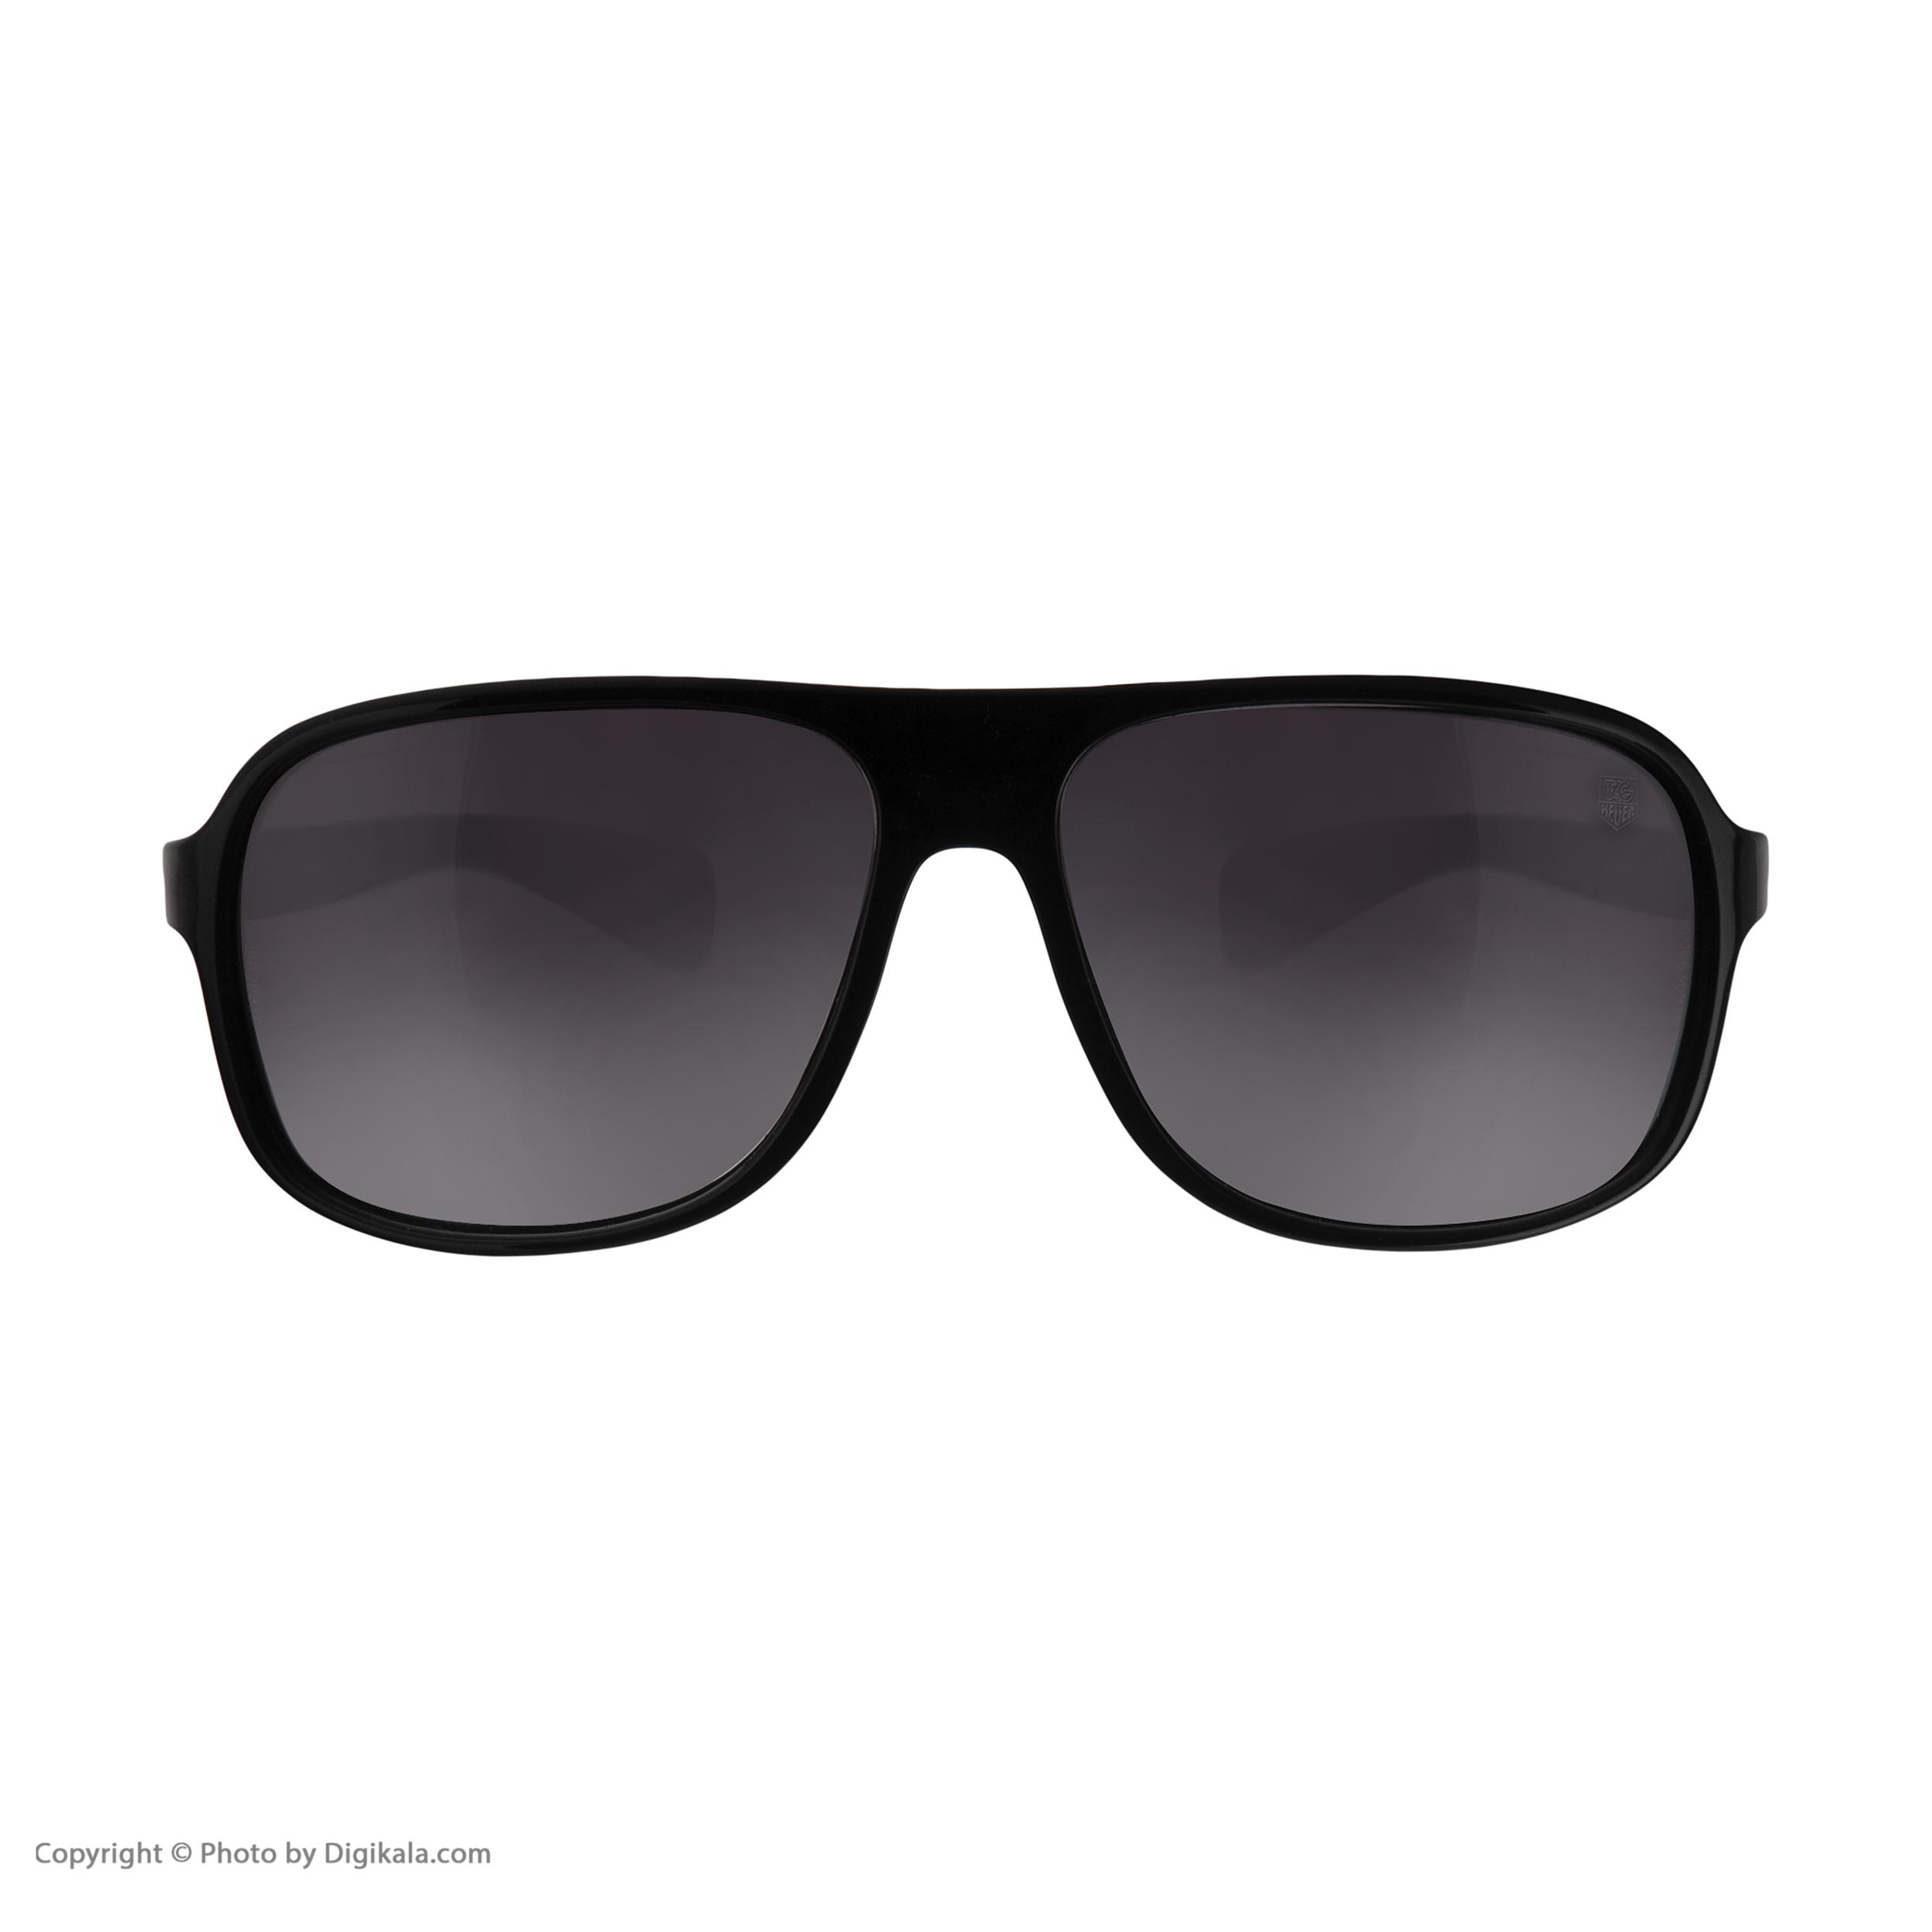 عینک آفتابی تگ هویر مدل 9301 -  - 5